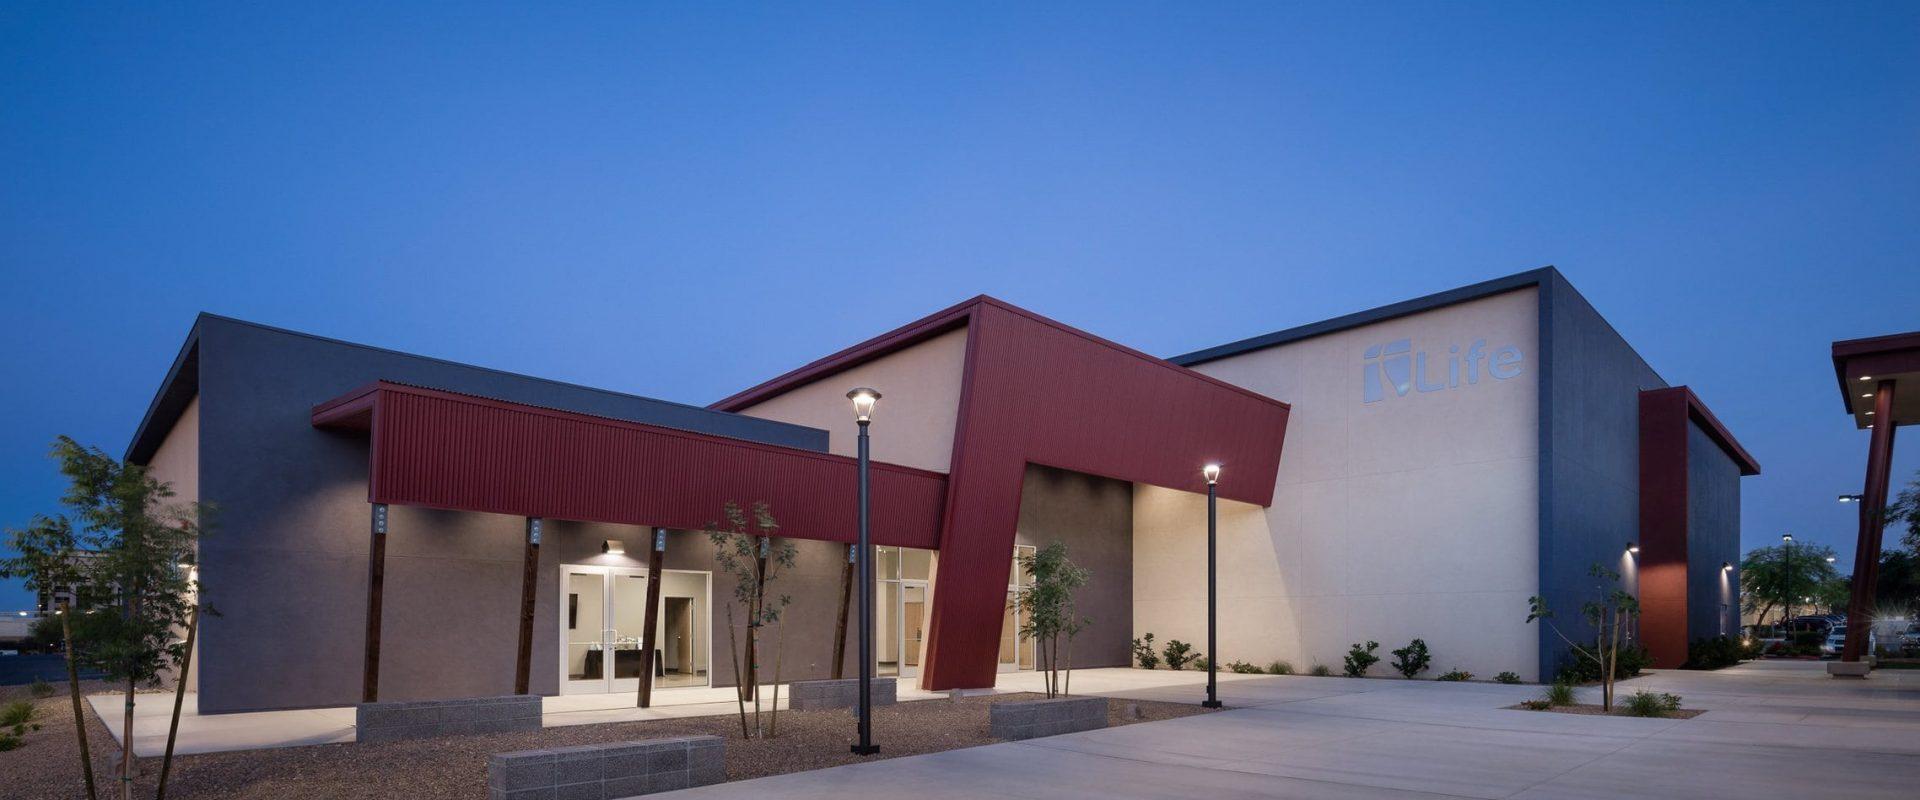 Life Baptist Church Sanctuary